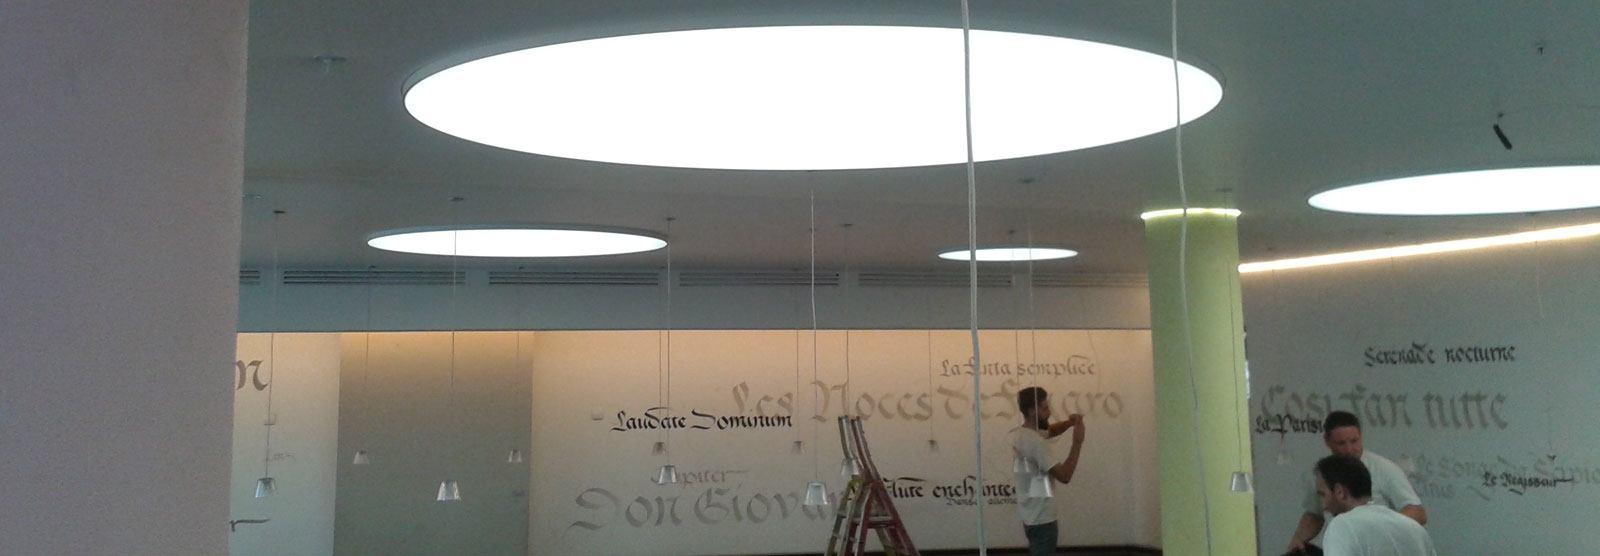 plafond tendu lm vente et installation de plafonds tendus en alsace. Black Bedroom Furniture Sets. Home Design Ideas